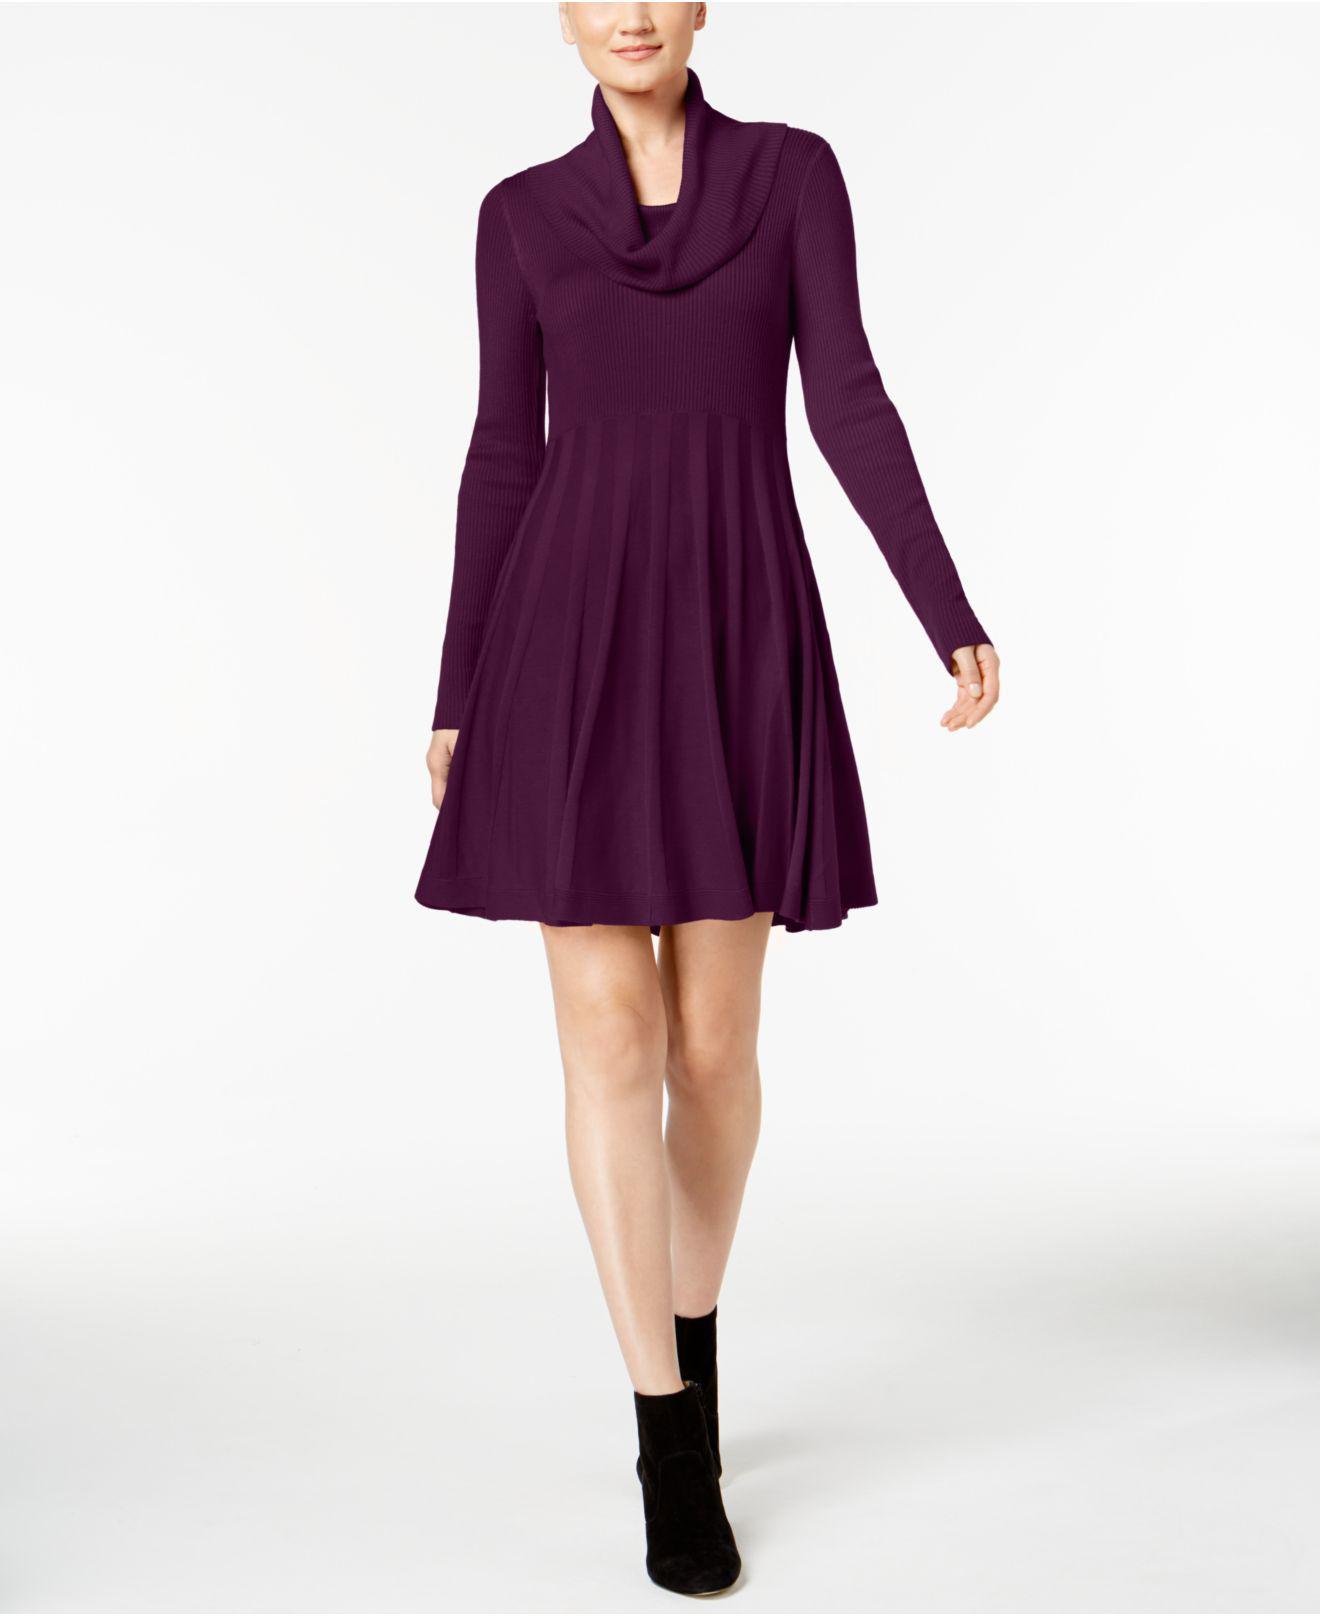 Cowl Neck Dress: CALVIN KLEIN 205W39NYC Cowl-neck Sweater Dress In Purple